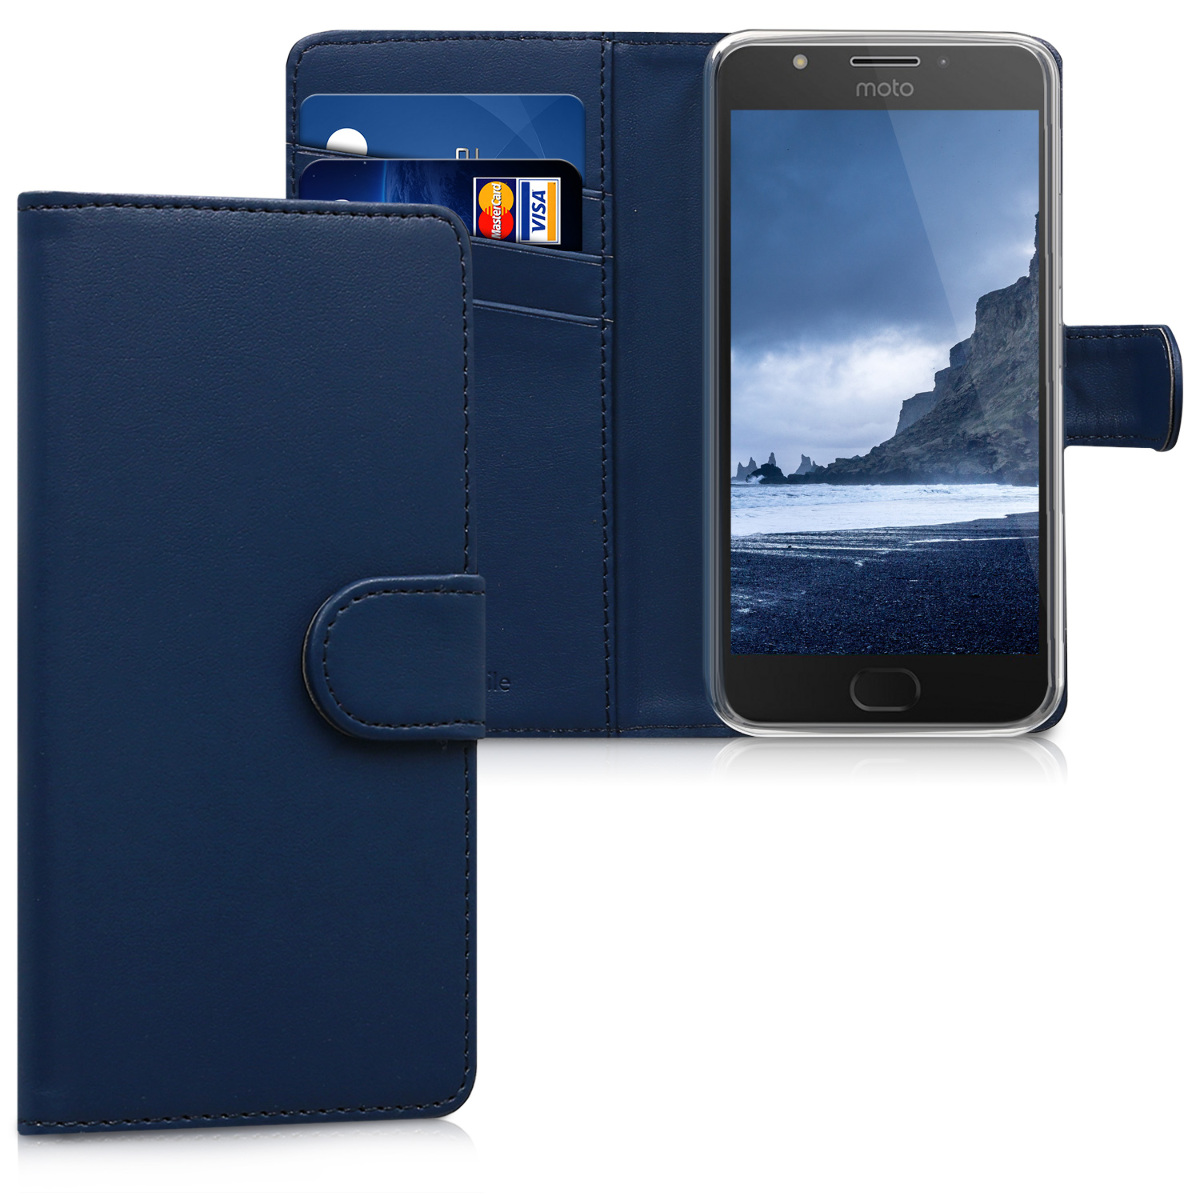 Kožené pouzdro   obal pro Motorola Moto E4 - Tmavě modrá